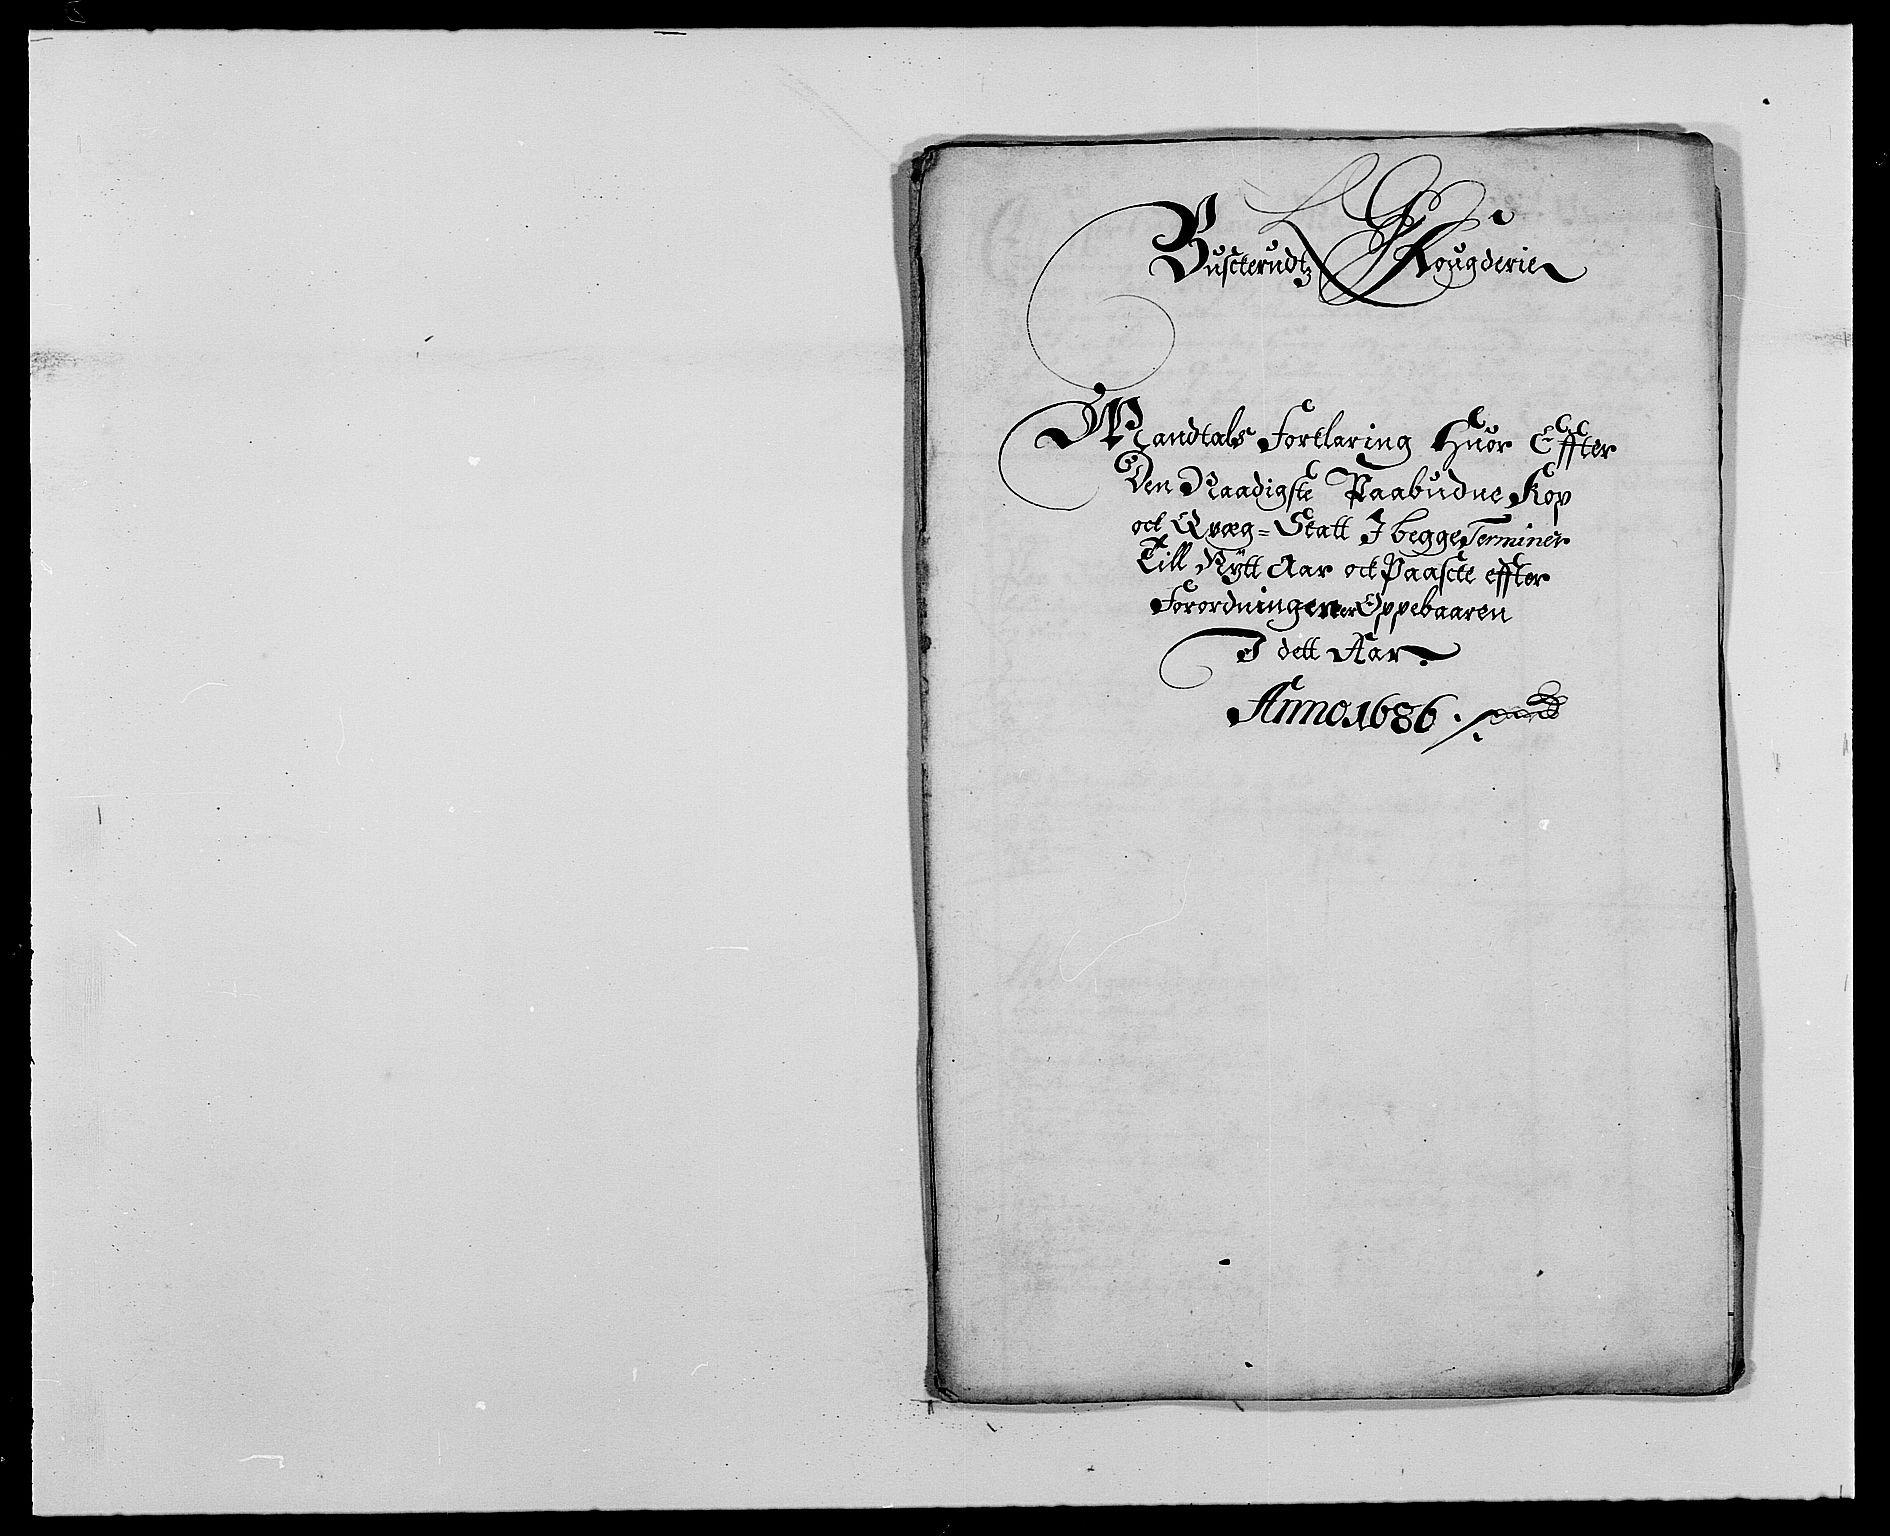 RA, Rentekammeret inntil 1814, Reviderte regnskaper, Fogderegnskap, R25/L1678: Fogderegnskap Buskerud, 1685-1686, s. 355